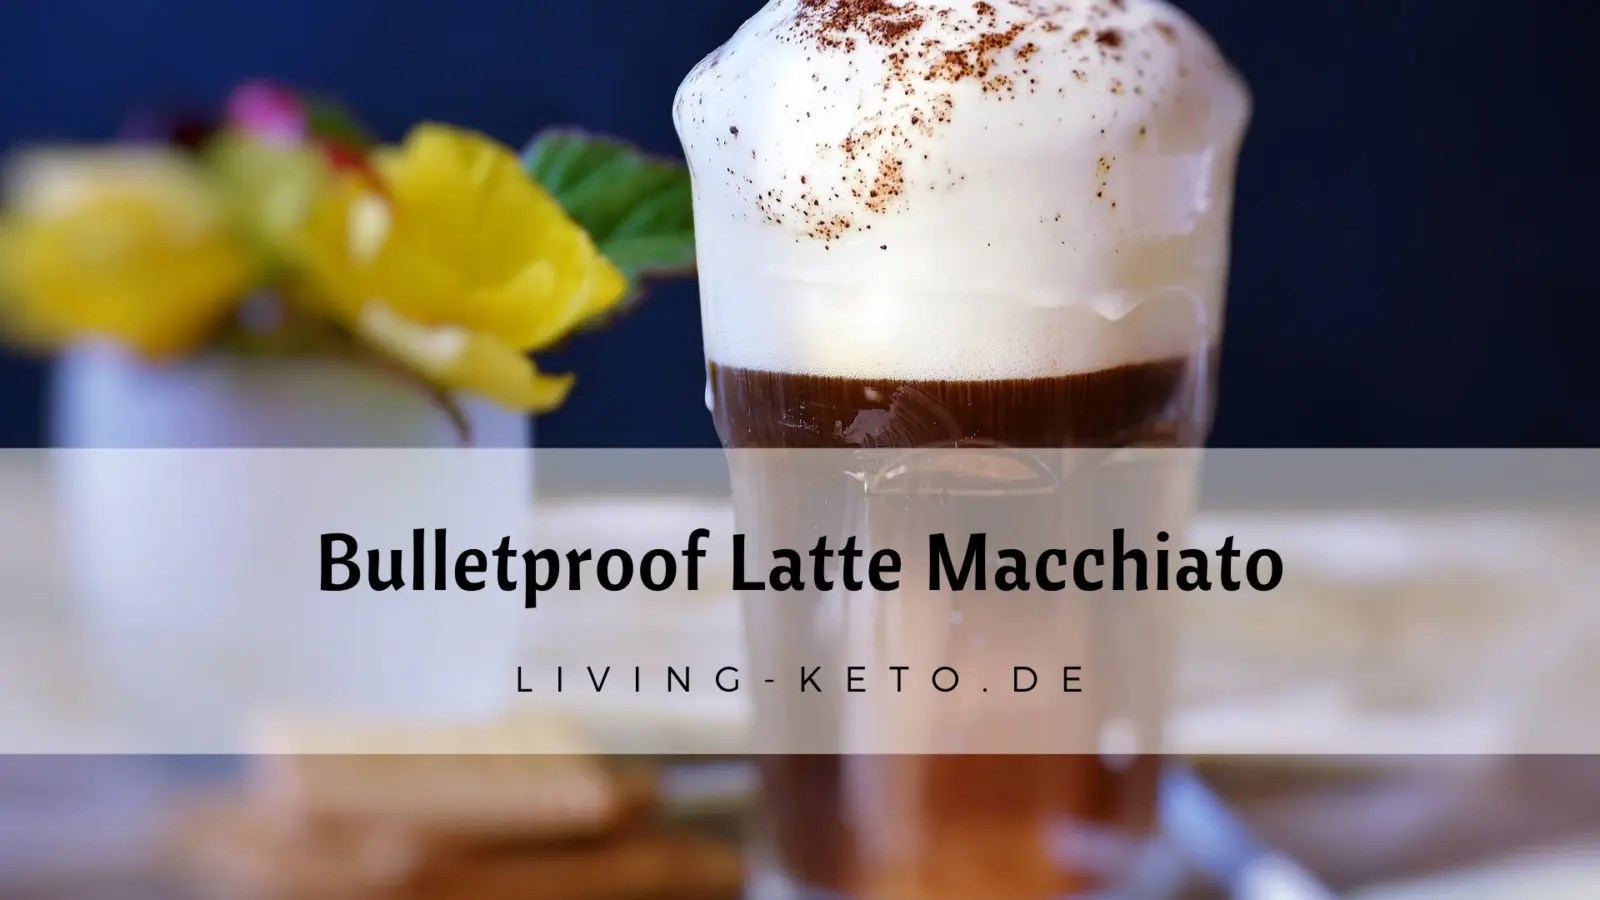 Bulletproof Latte Macchiato